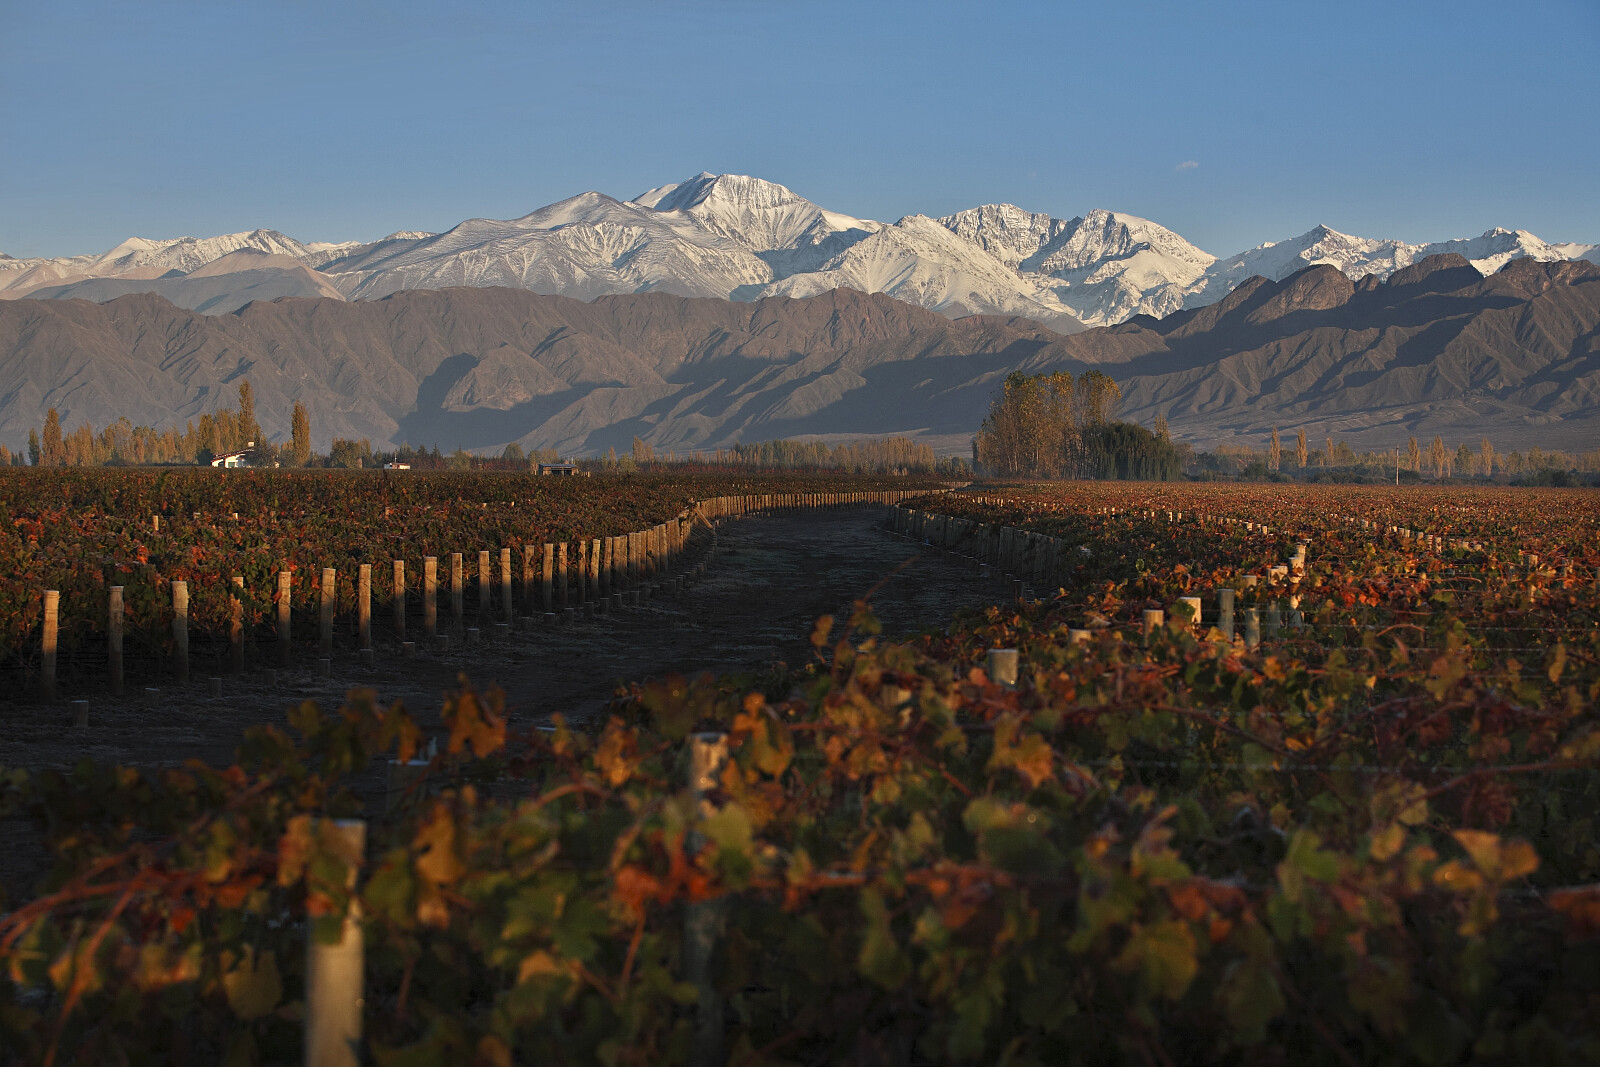 Mendoza-vineyards.JPG [2.26 MB]